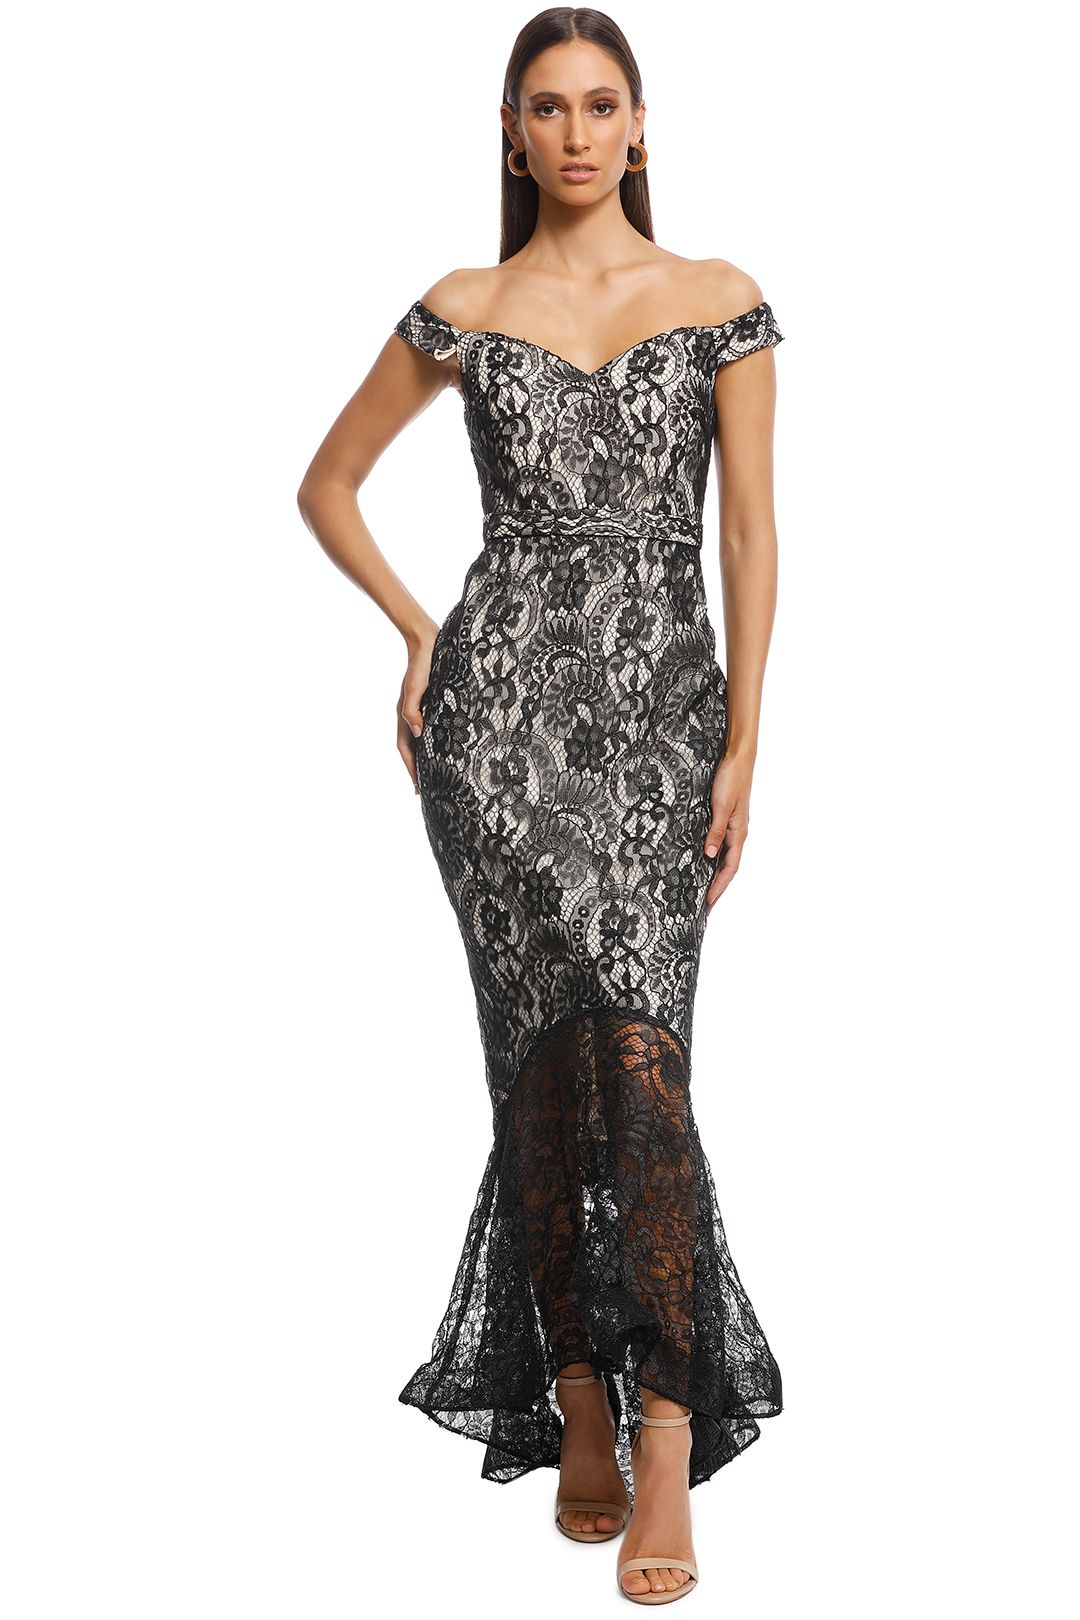 Jadore - Candy Dress - Black - Front